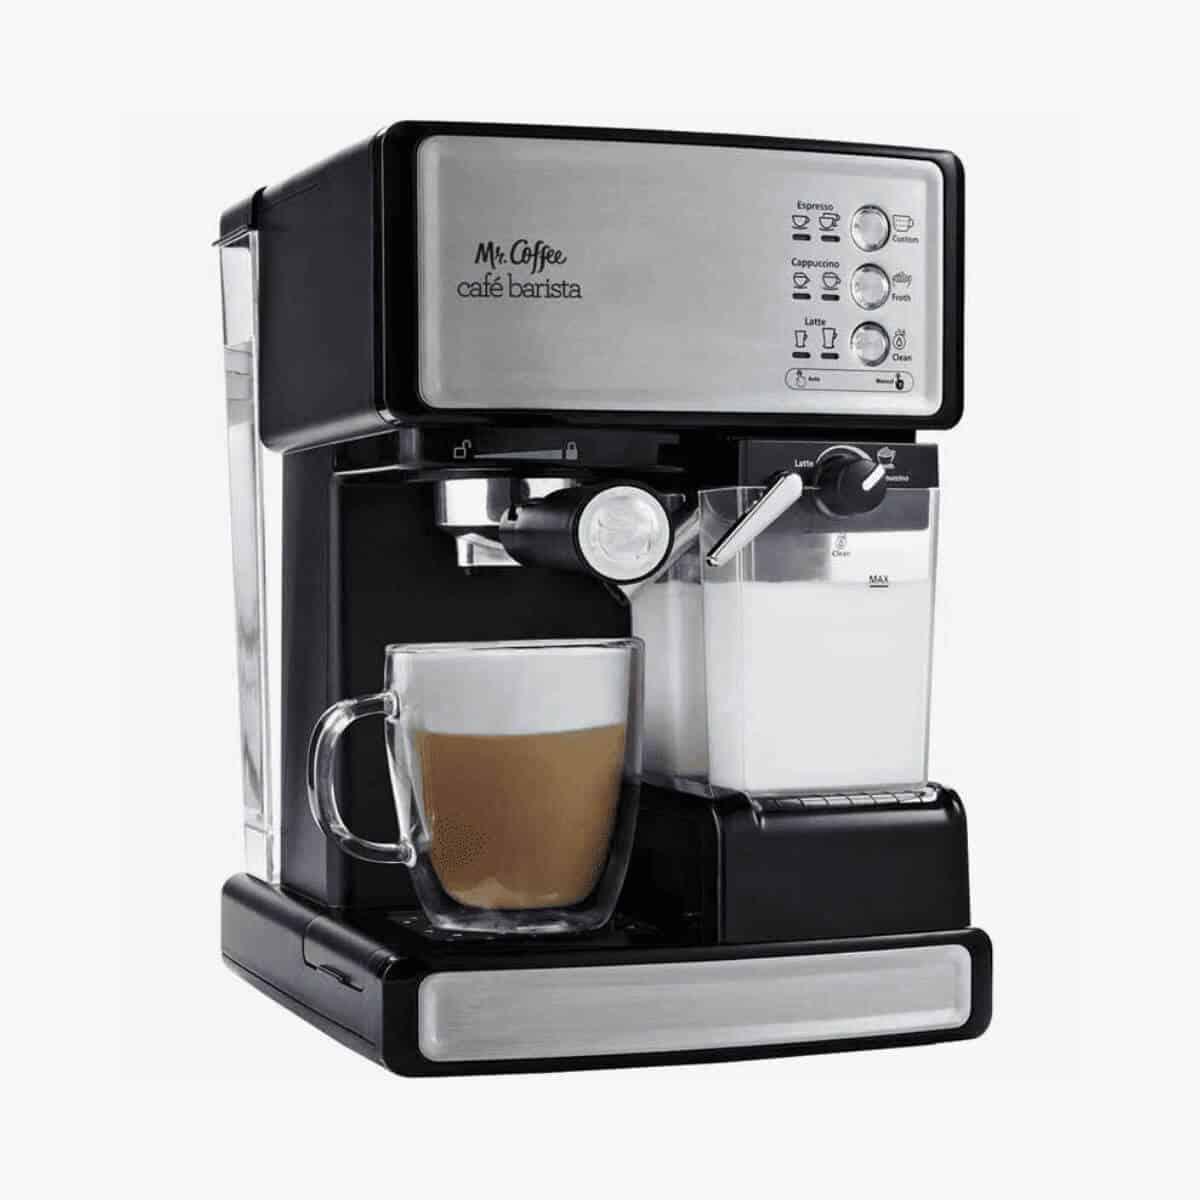 Mr. Coffee espresso machine with a mug.